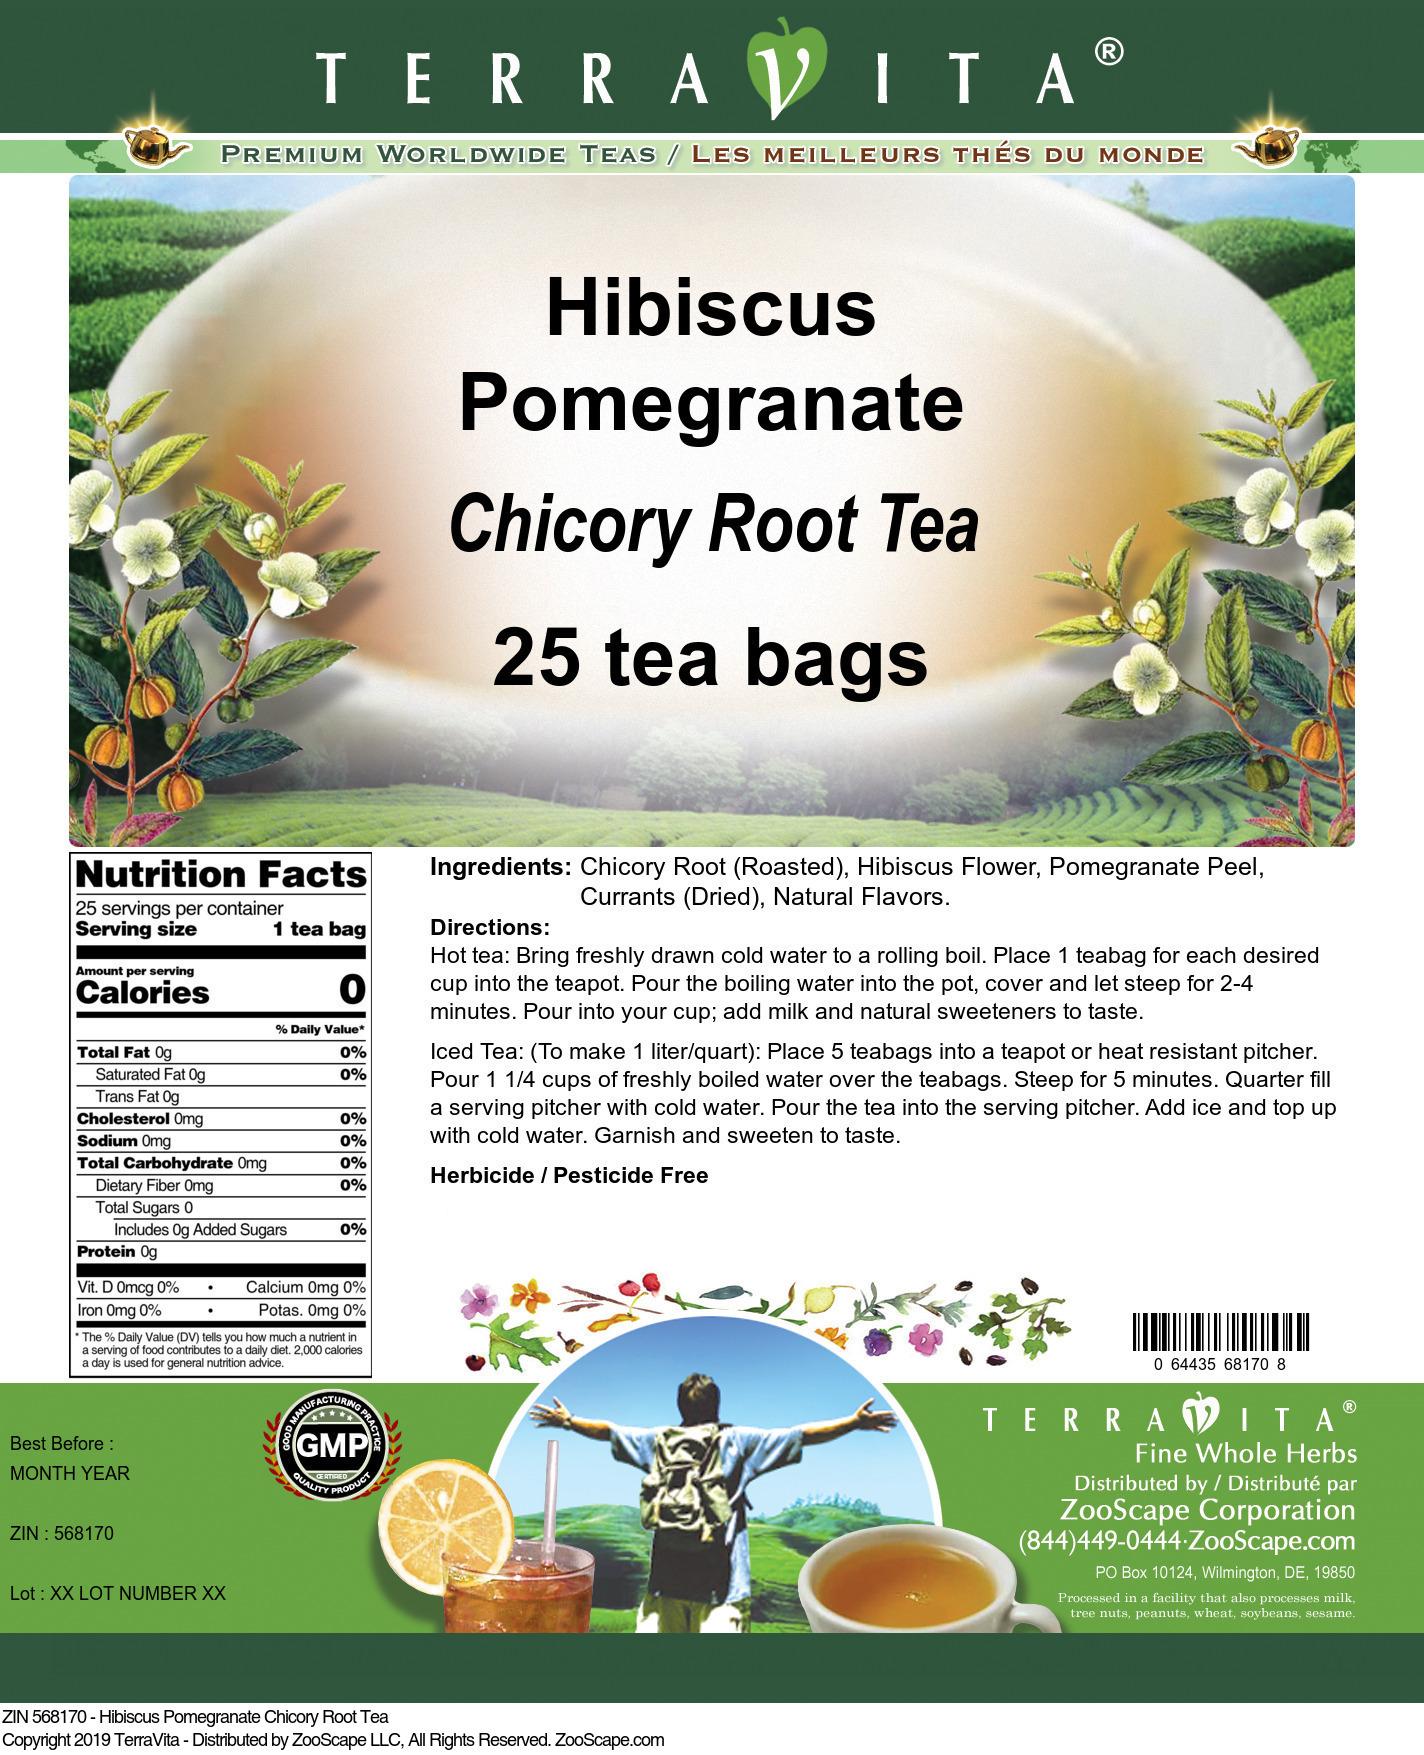 Hibiscus Pomegranate Chicory Root Tea